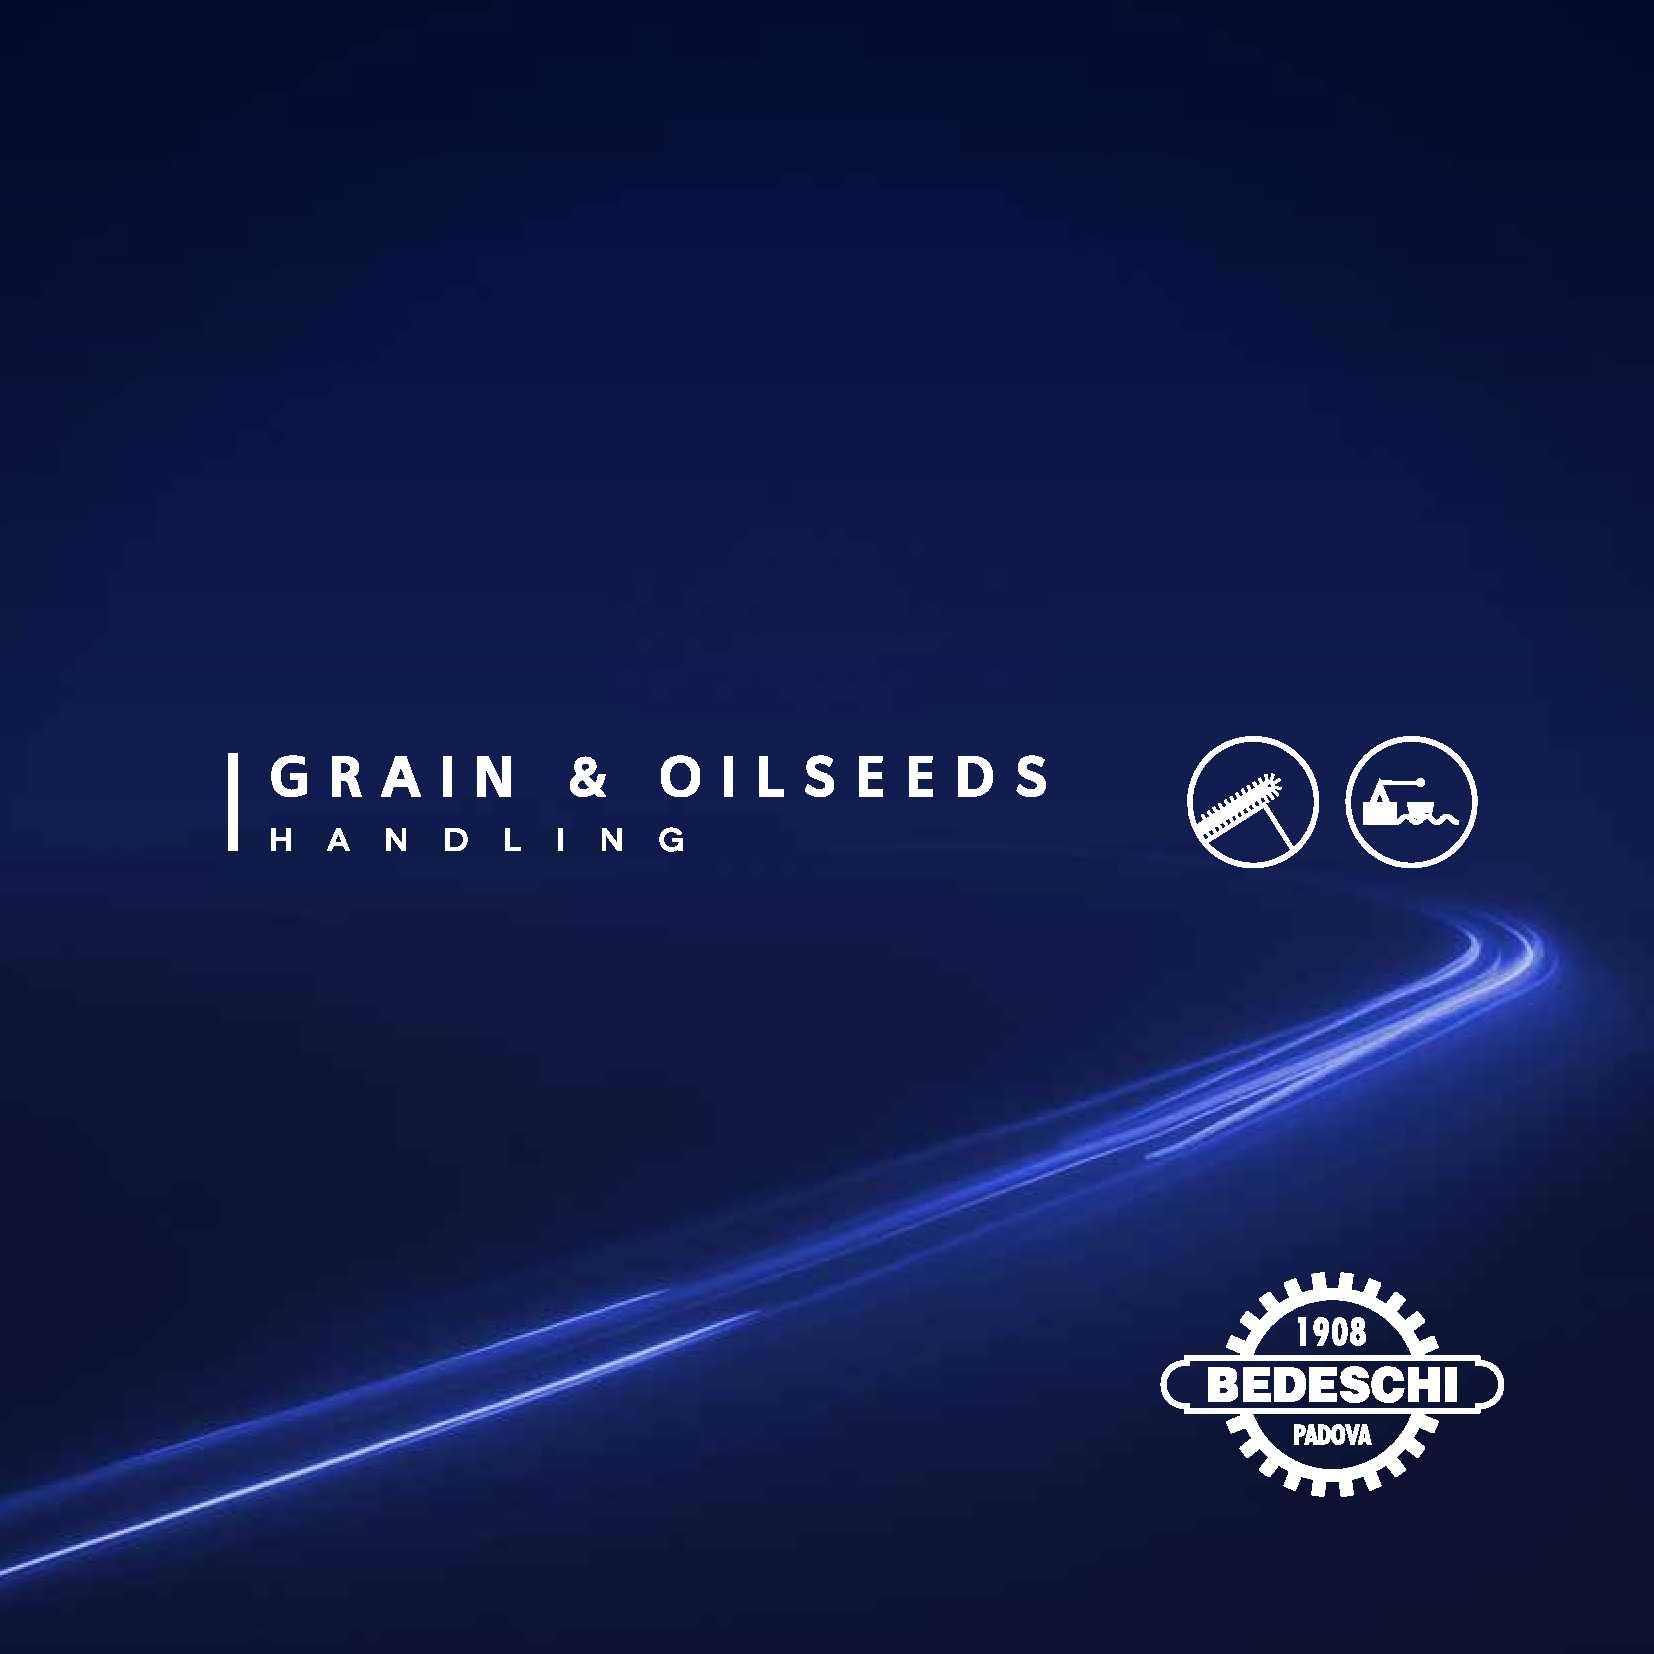 Grain_Oilseeds